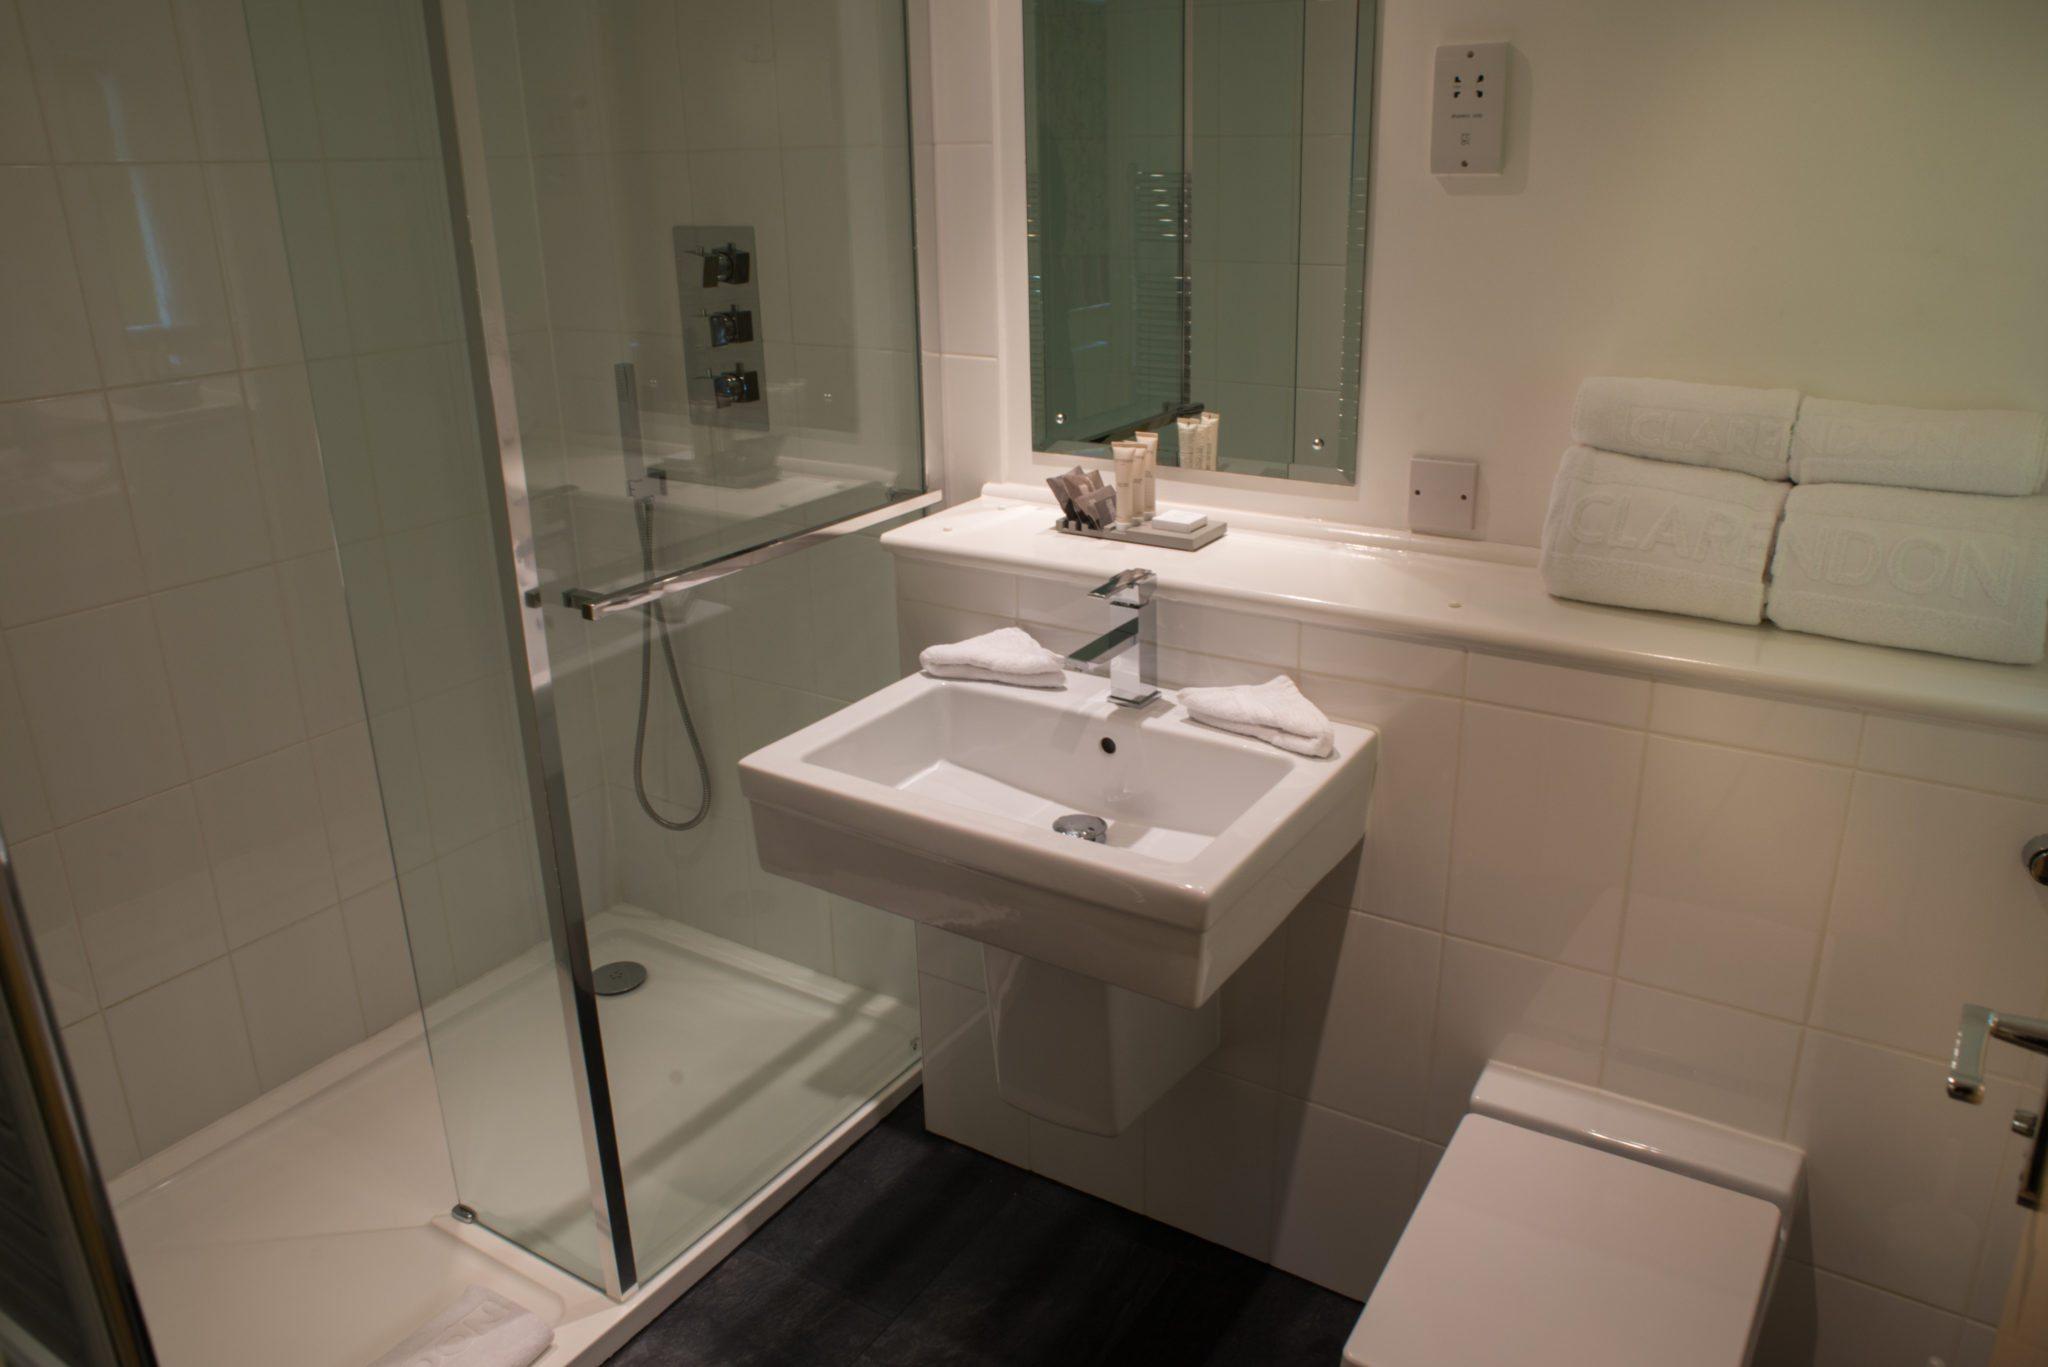 North Mews Serviced Apartments - Holborn, London